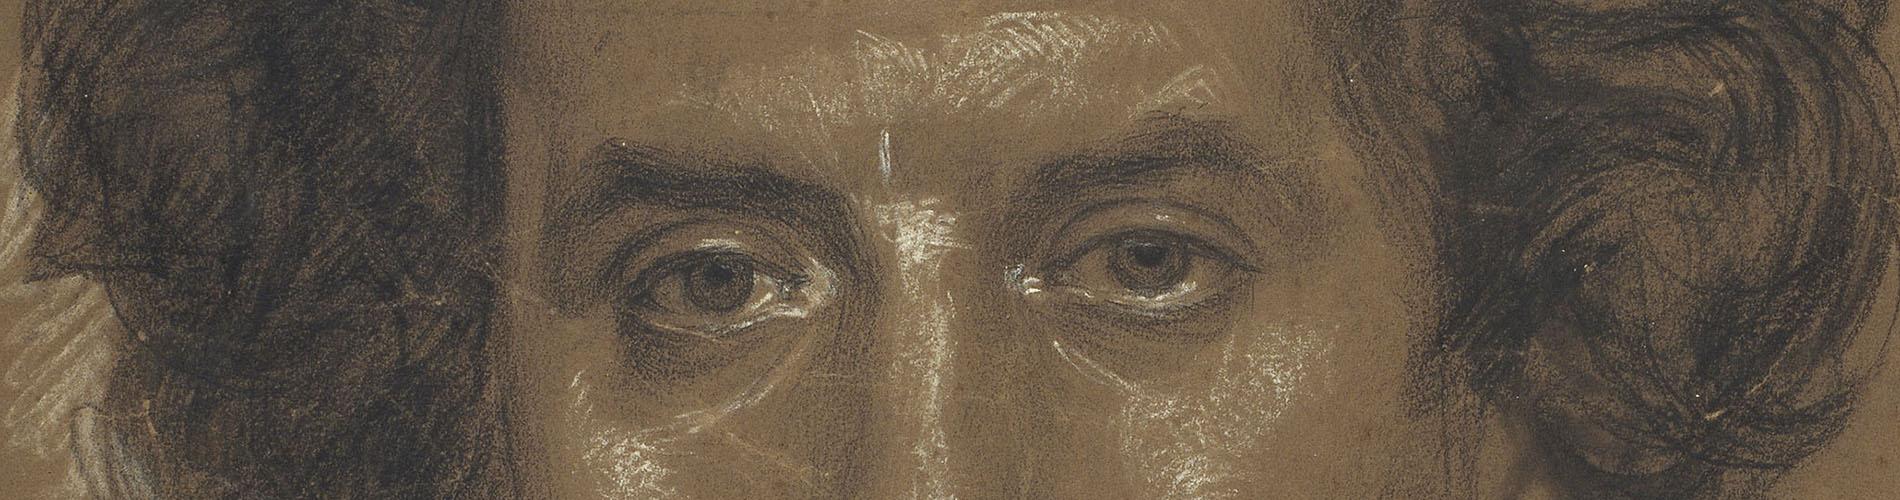 Ramon Martí i Alsina, Self-portrait, circa 1875